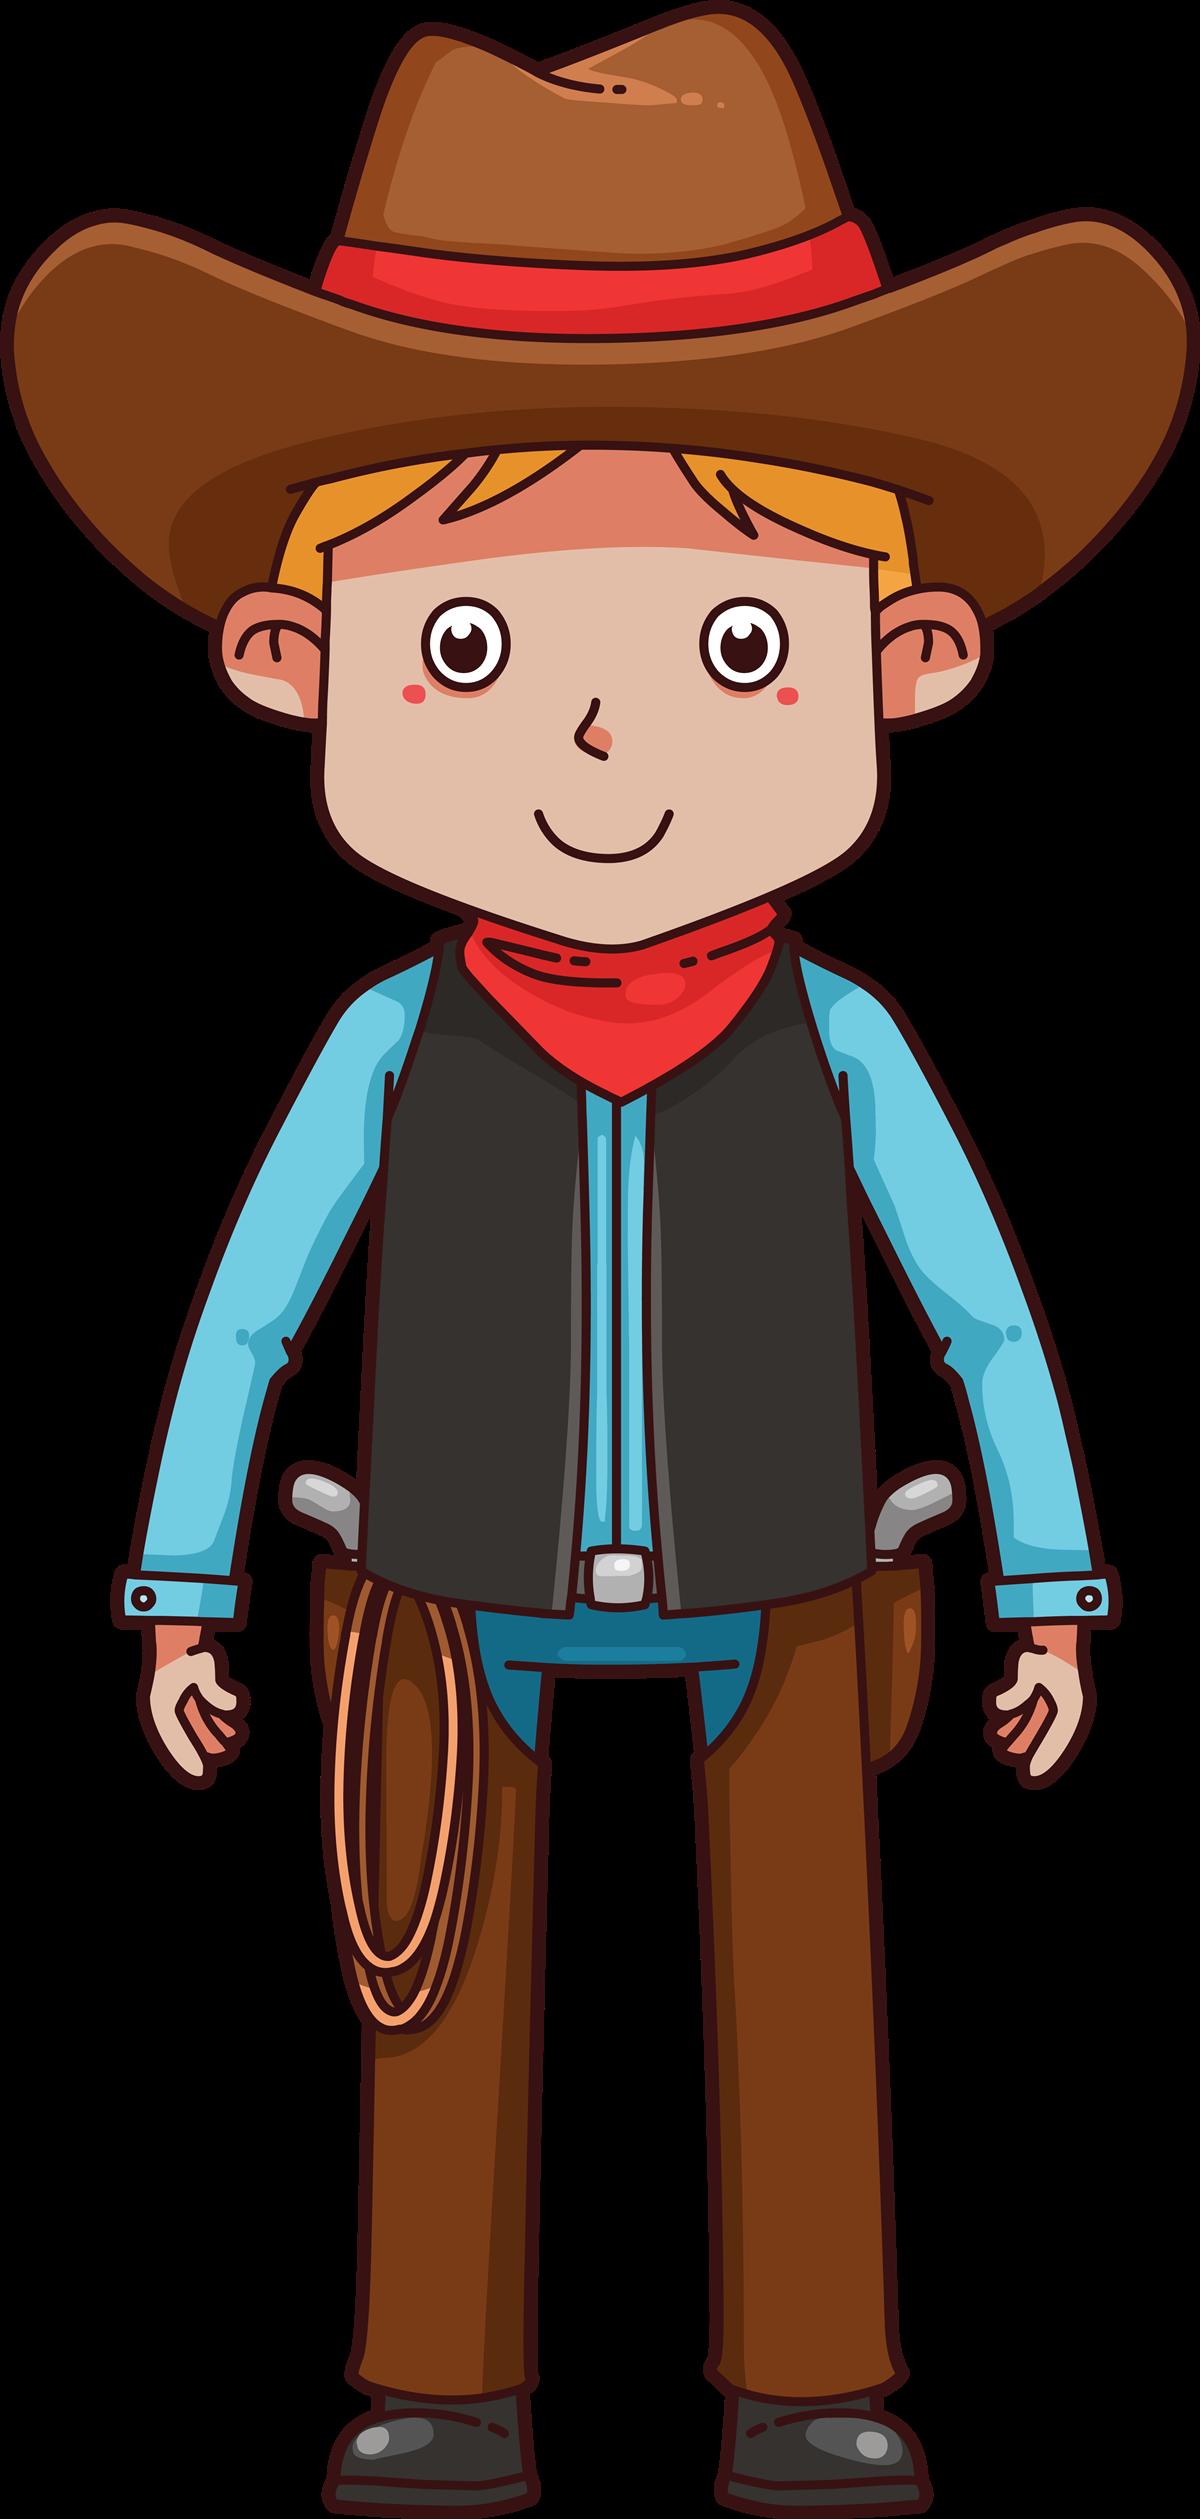 Free Cartoon Cowboy Cliparts, Download Free Clip Art, Free.